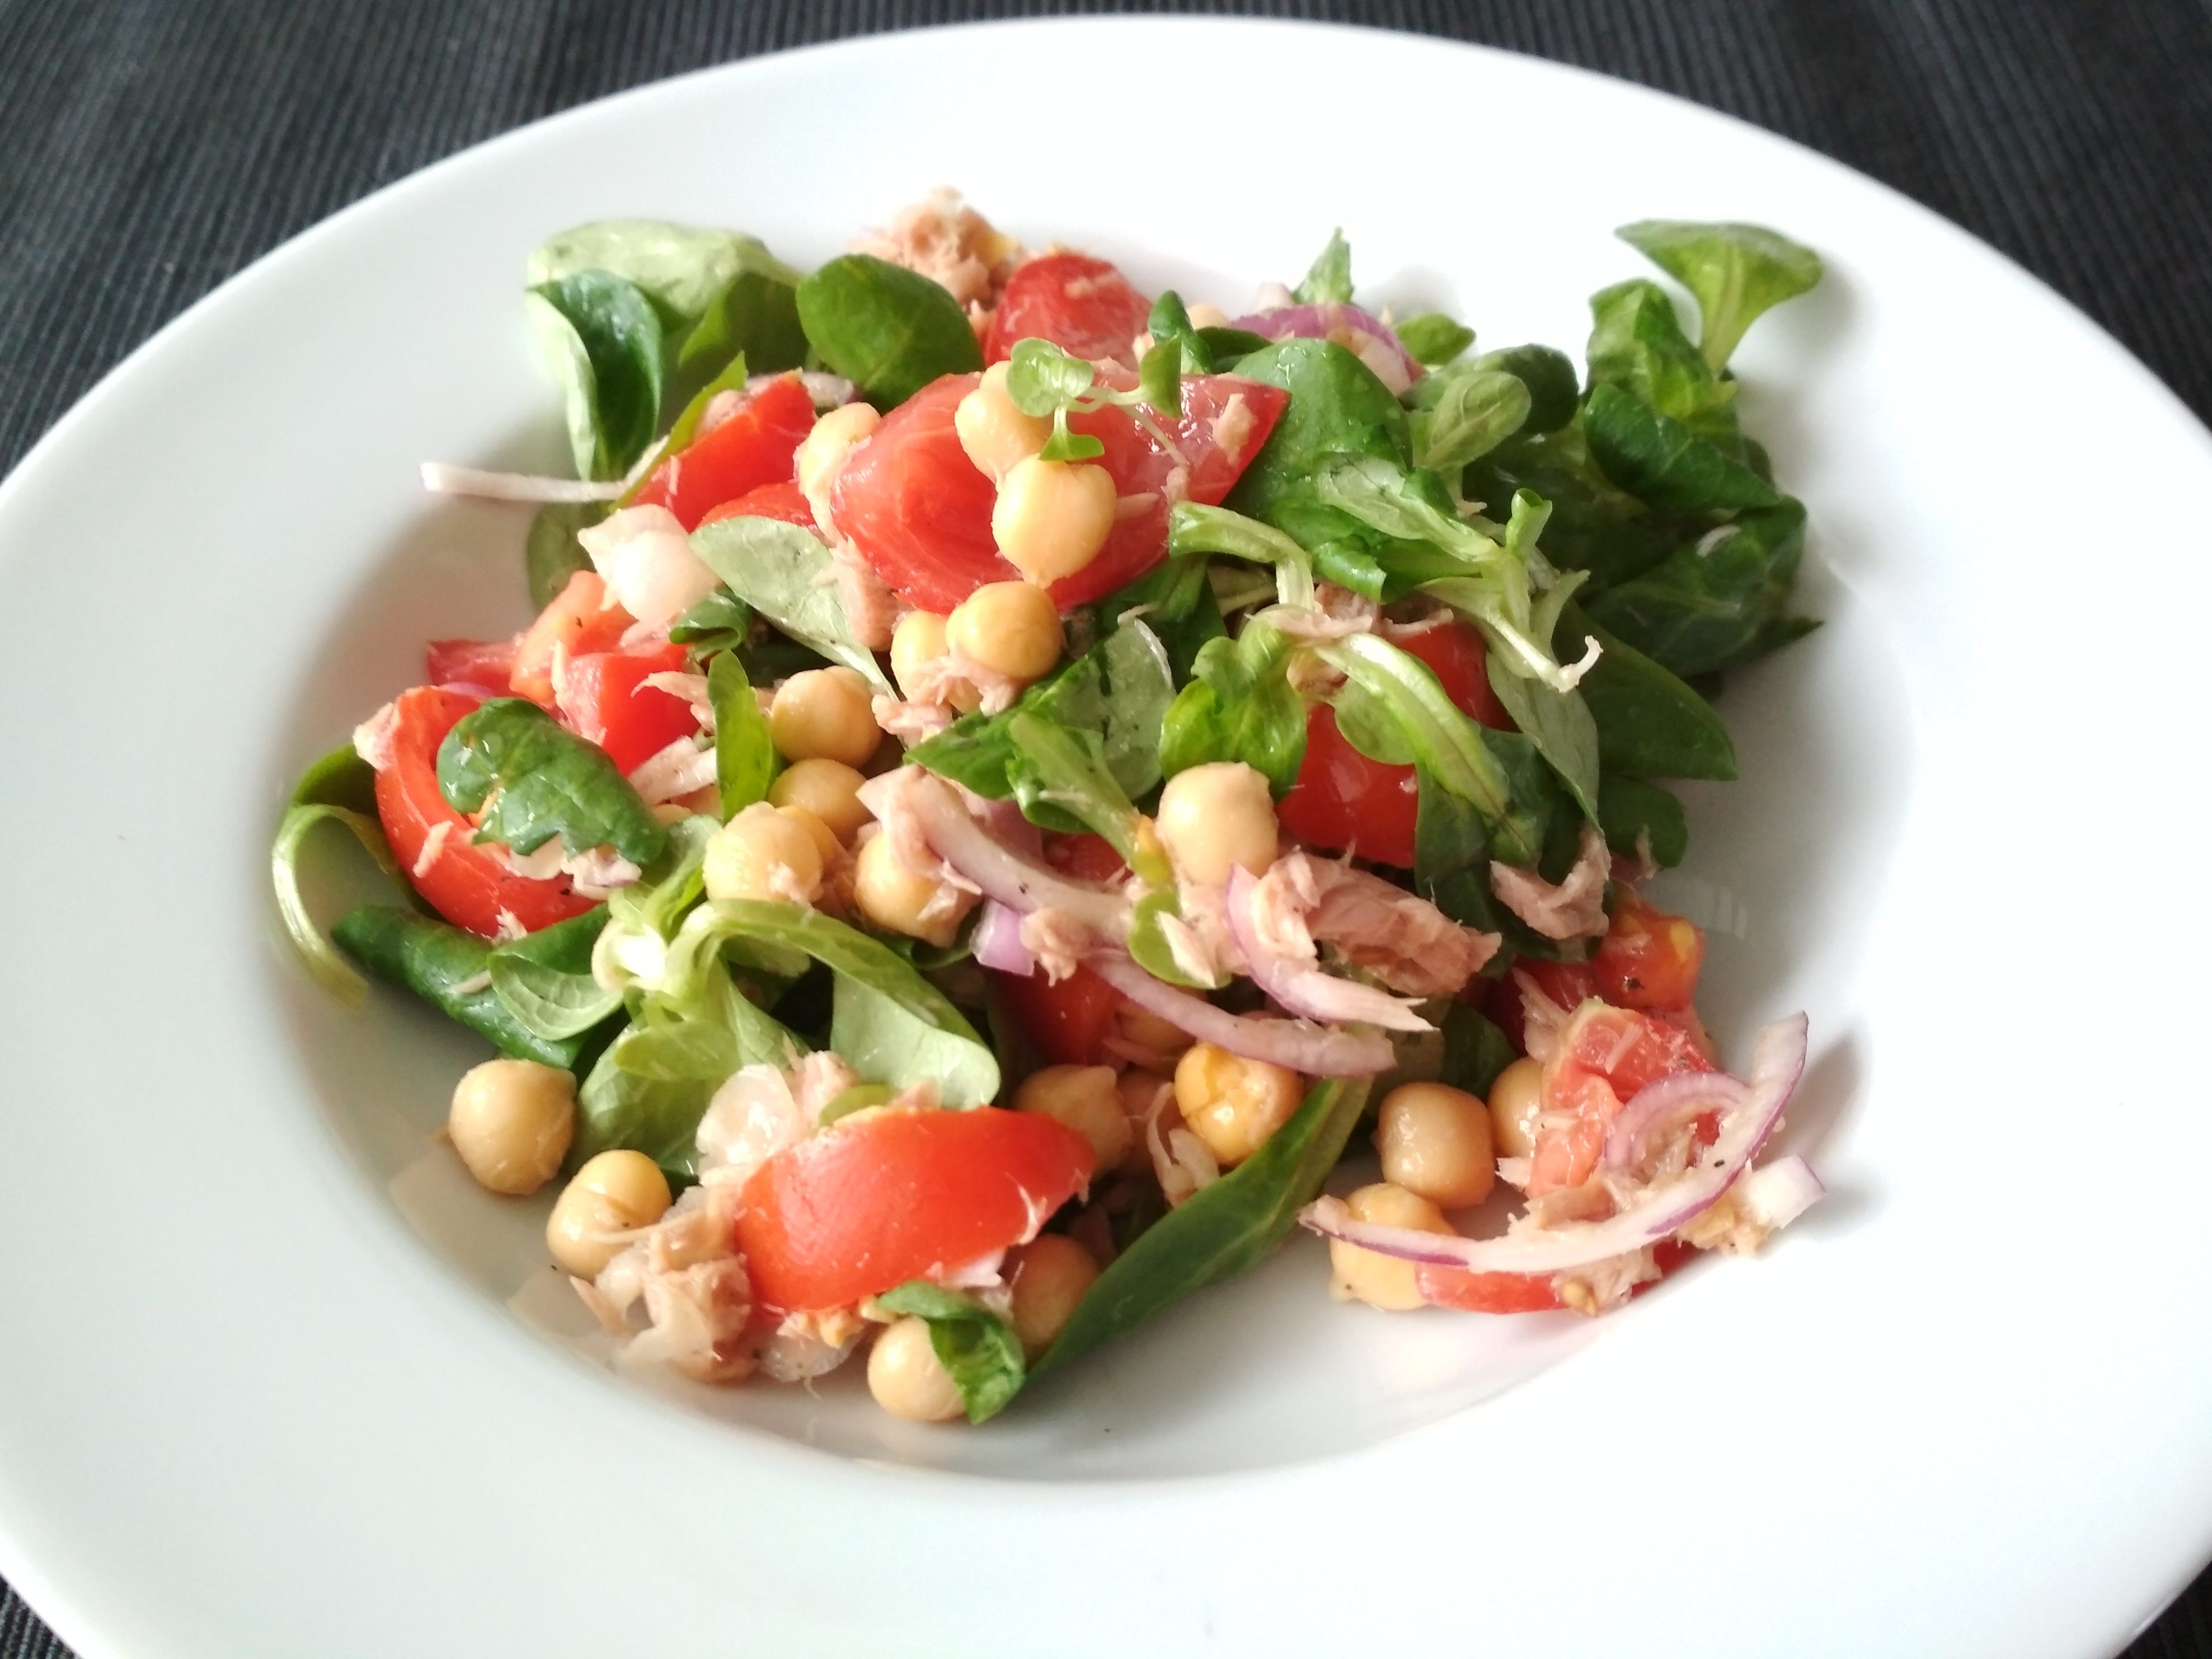 Gluten-free chickpea tuna salad